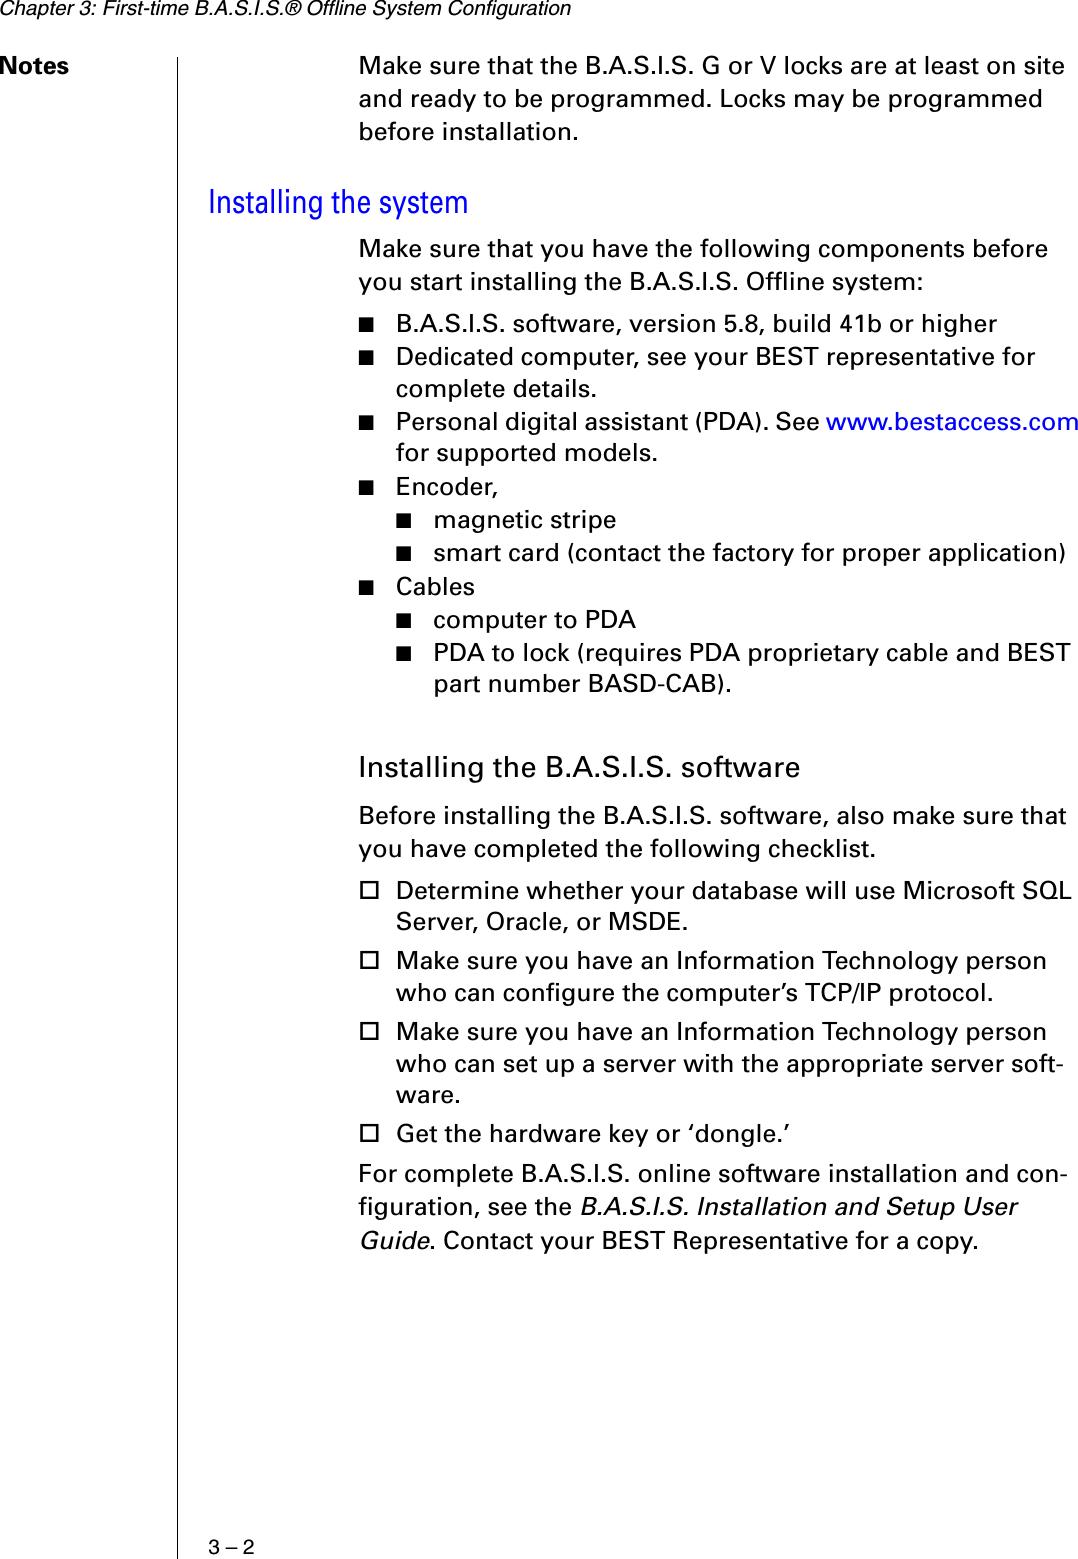 Alarm Cctv Distribution Inc Manual Guide